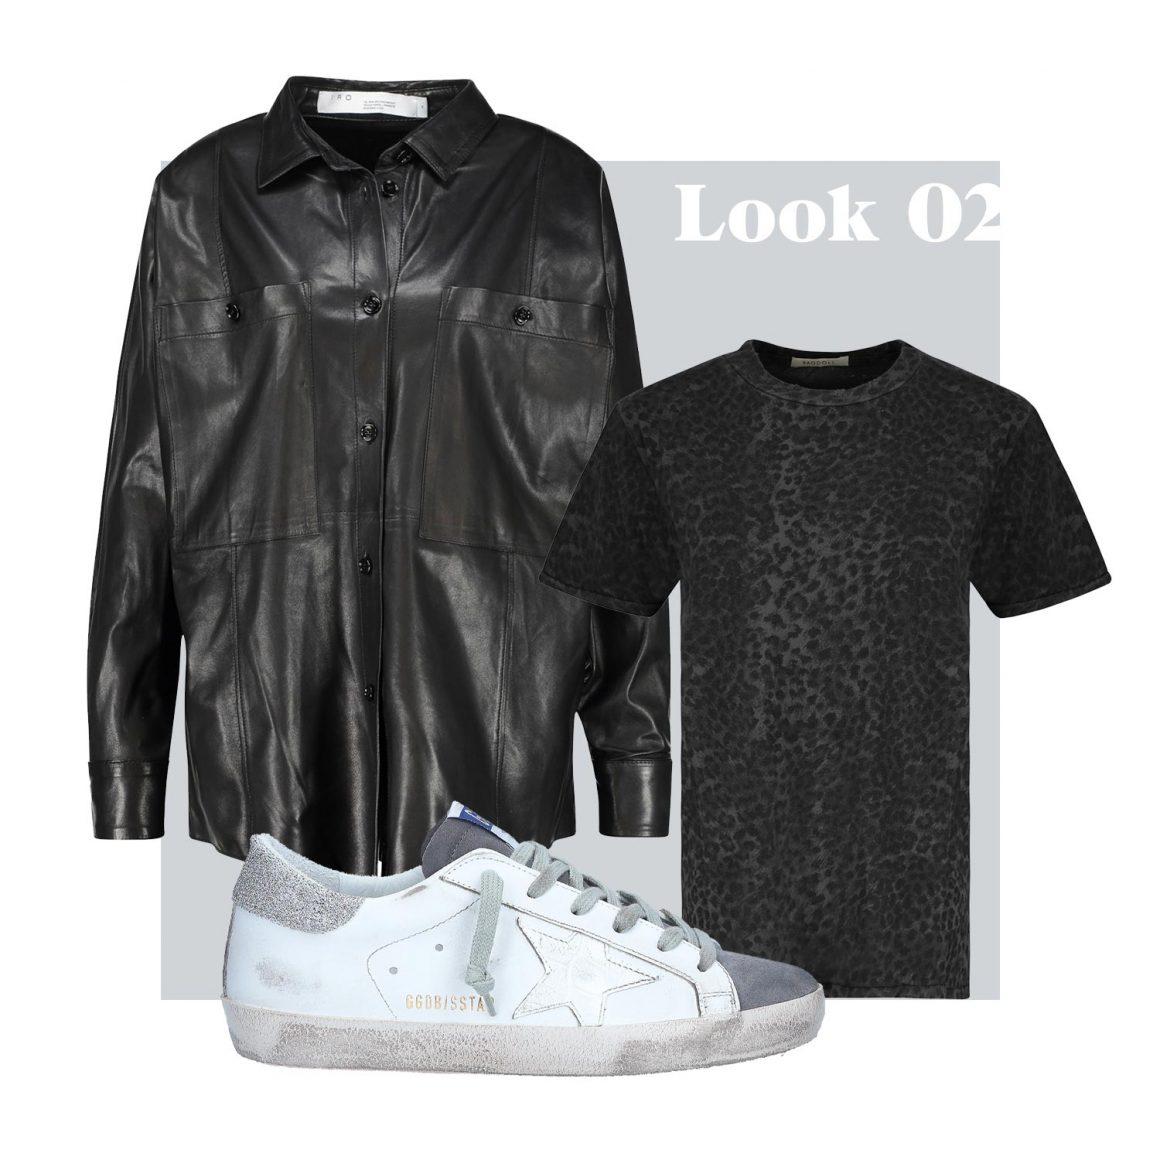 Chemise cuir IRO, Tee-shirt Ragdoll LA et sneakers Golden Goose